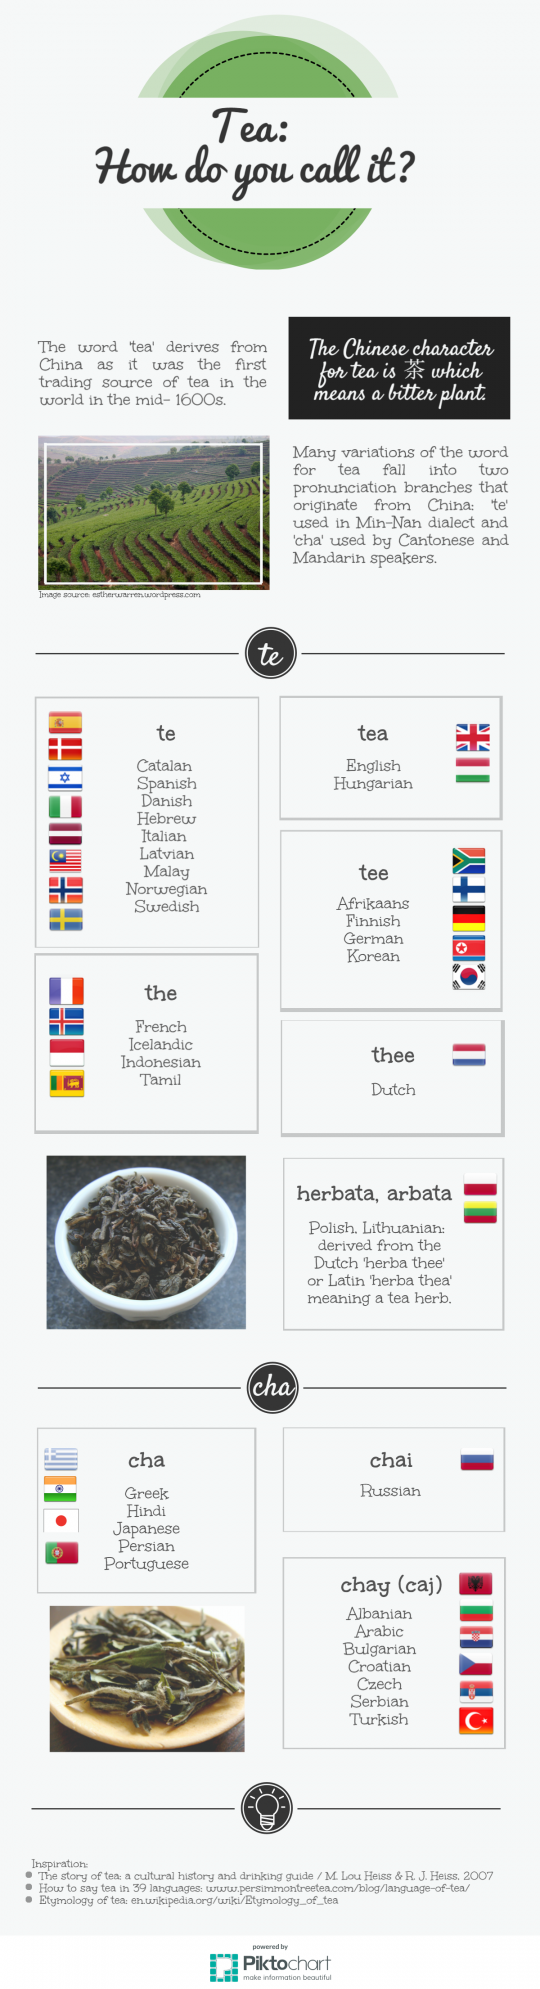 Tea: how do you call it?